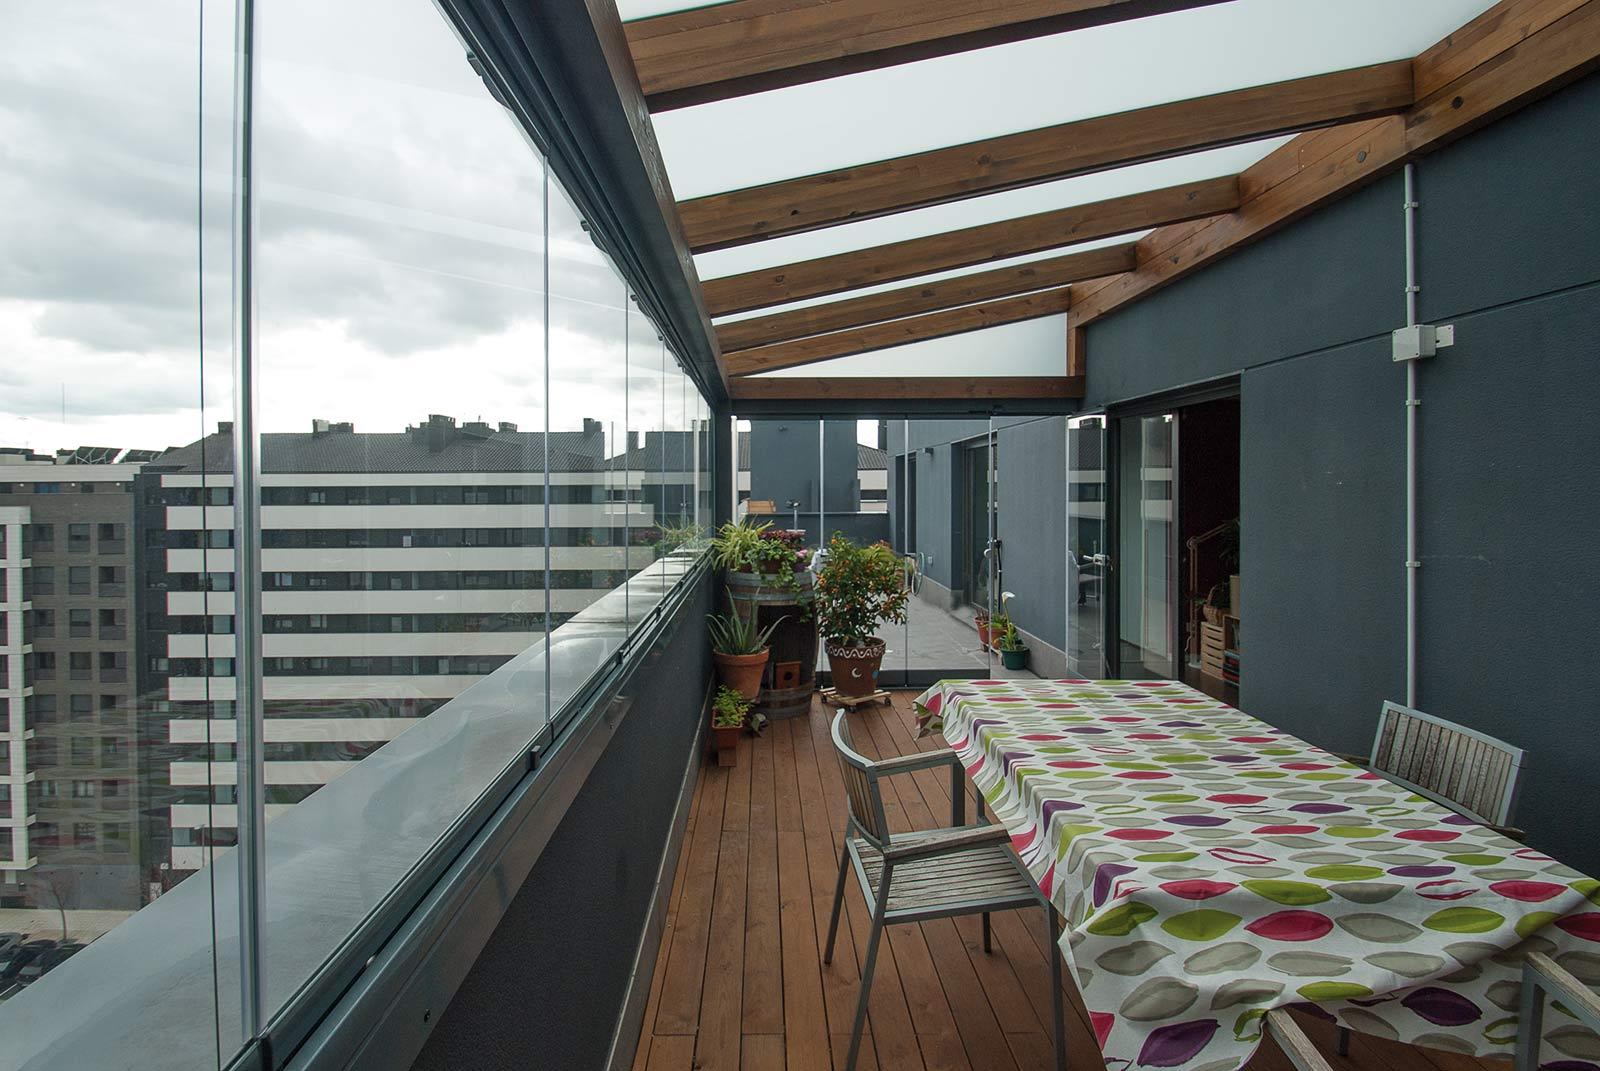 Pergolas para terrazas de aticos trendy decoracion terraza atico diseno cama balanceante madera - Toldos para aticos ...